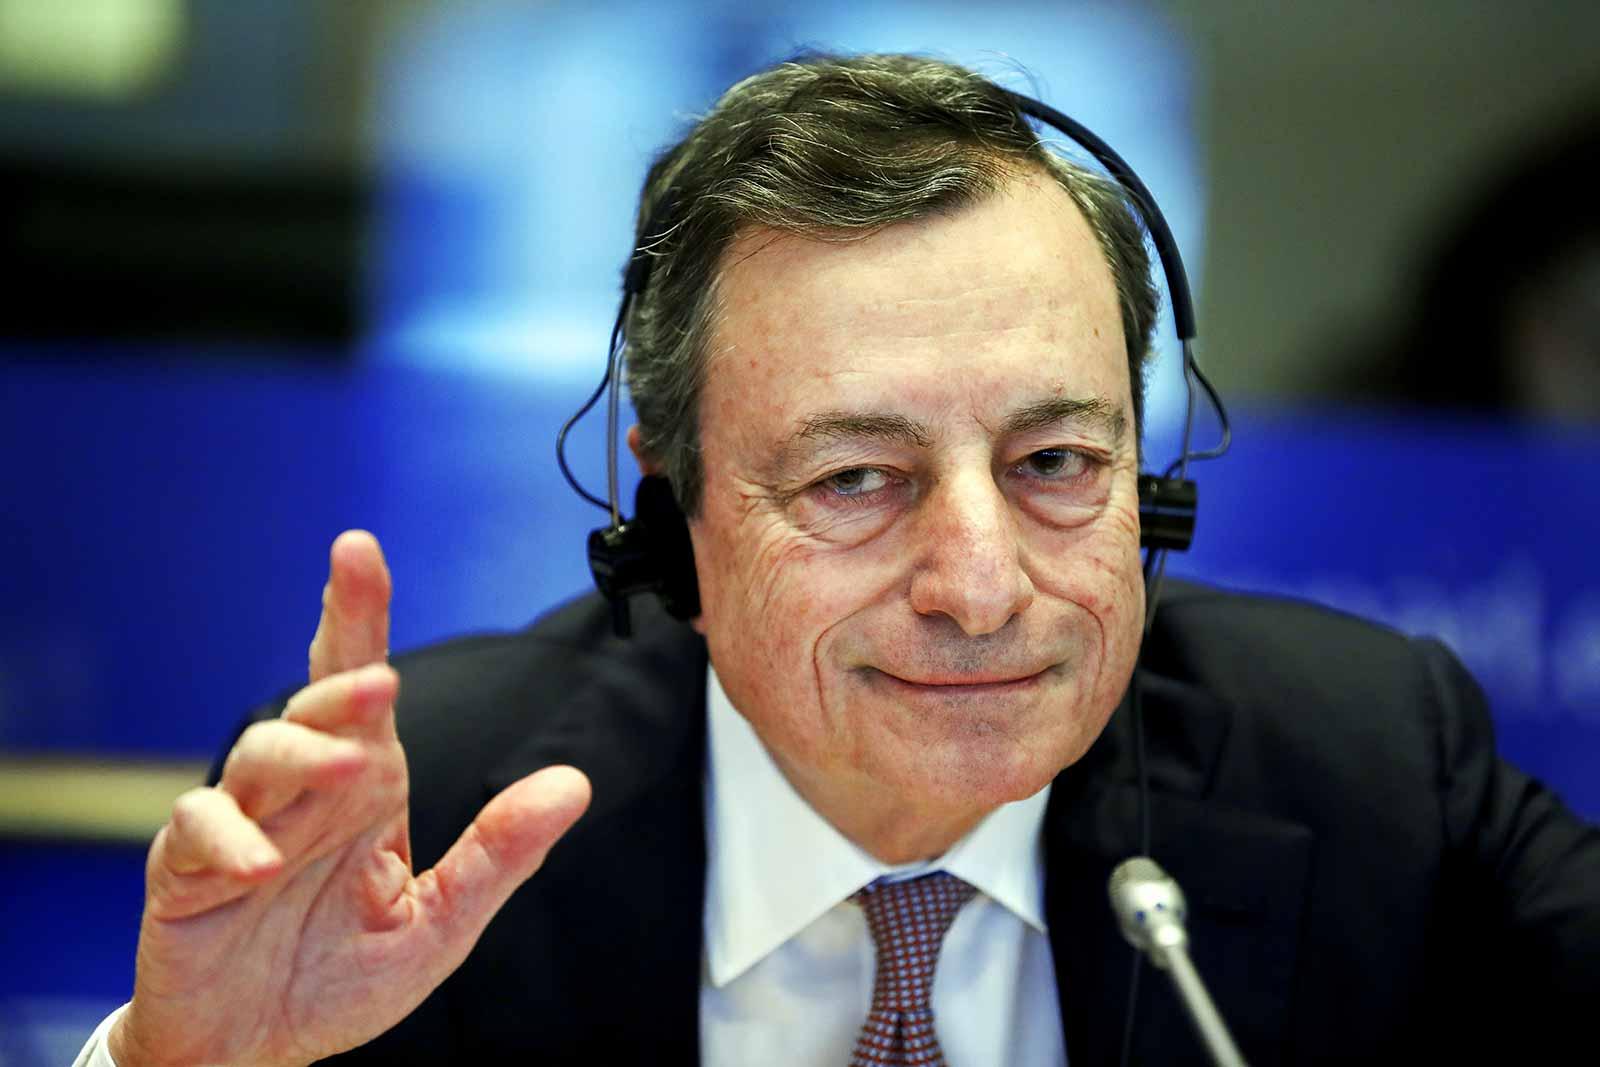 Mario Draghi, ECB President at the EU Parliament